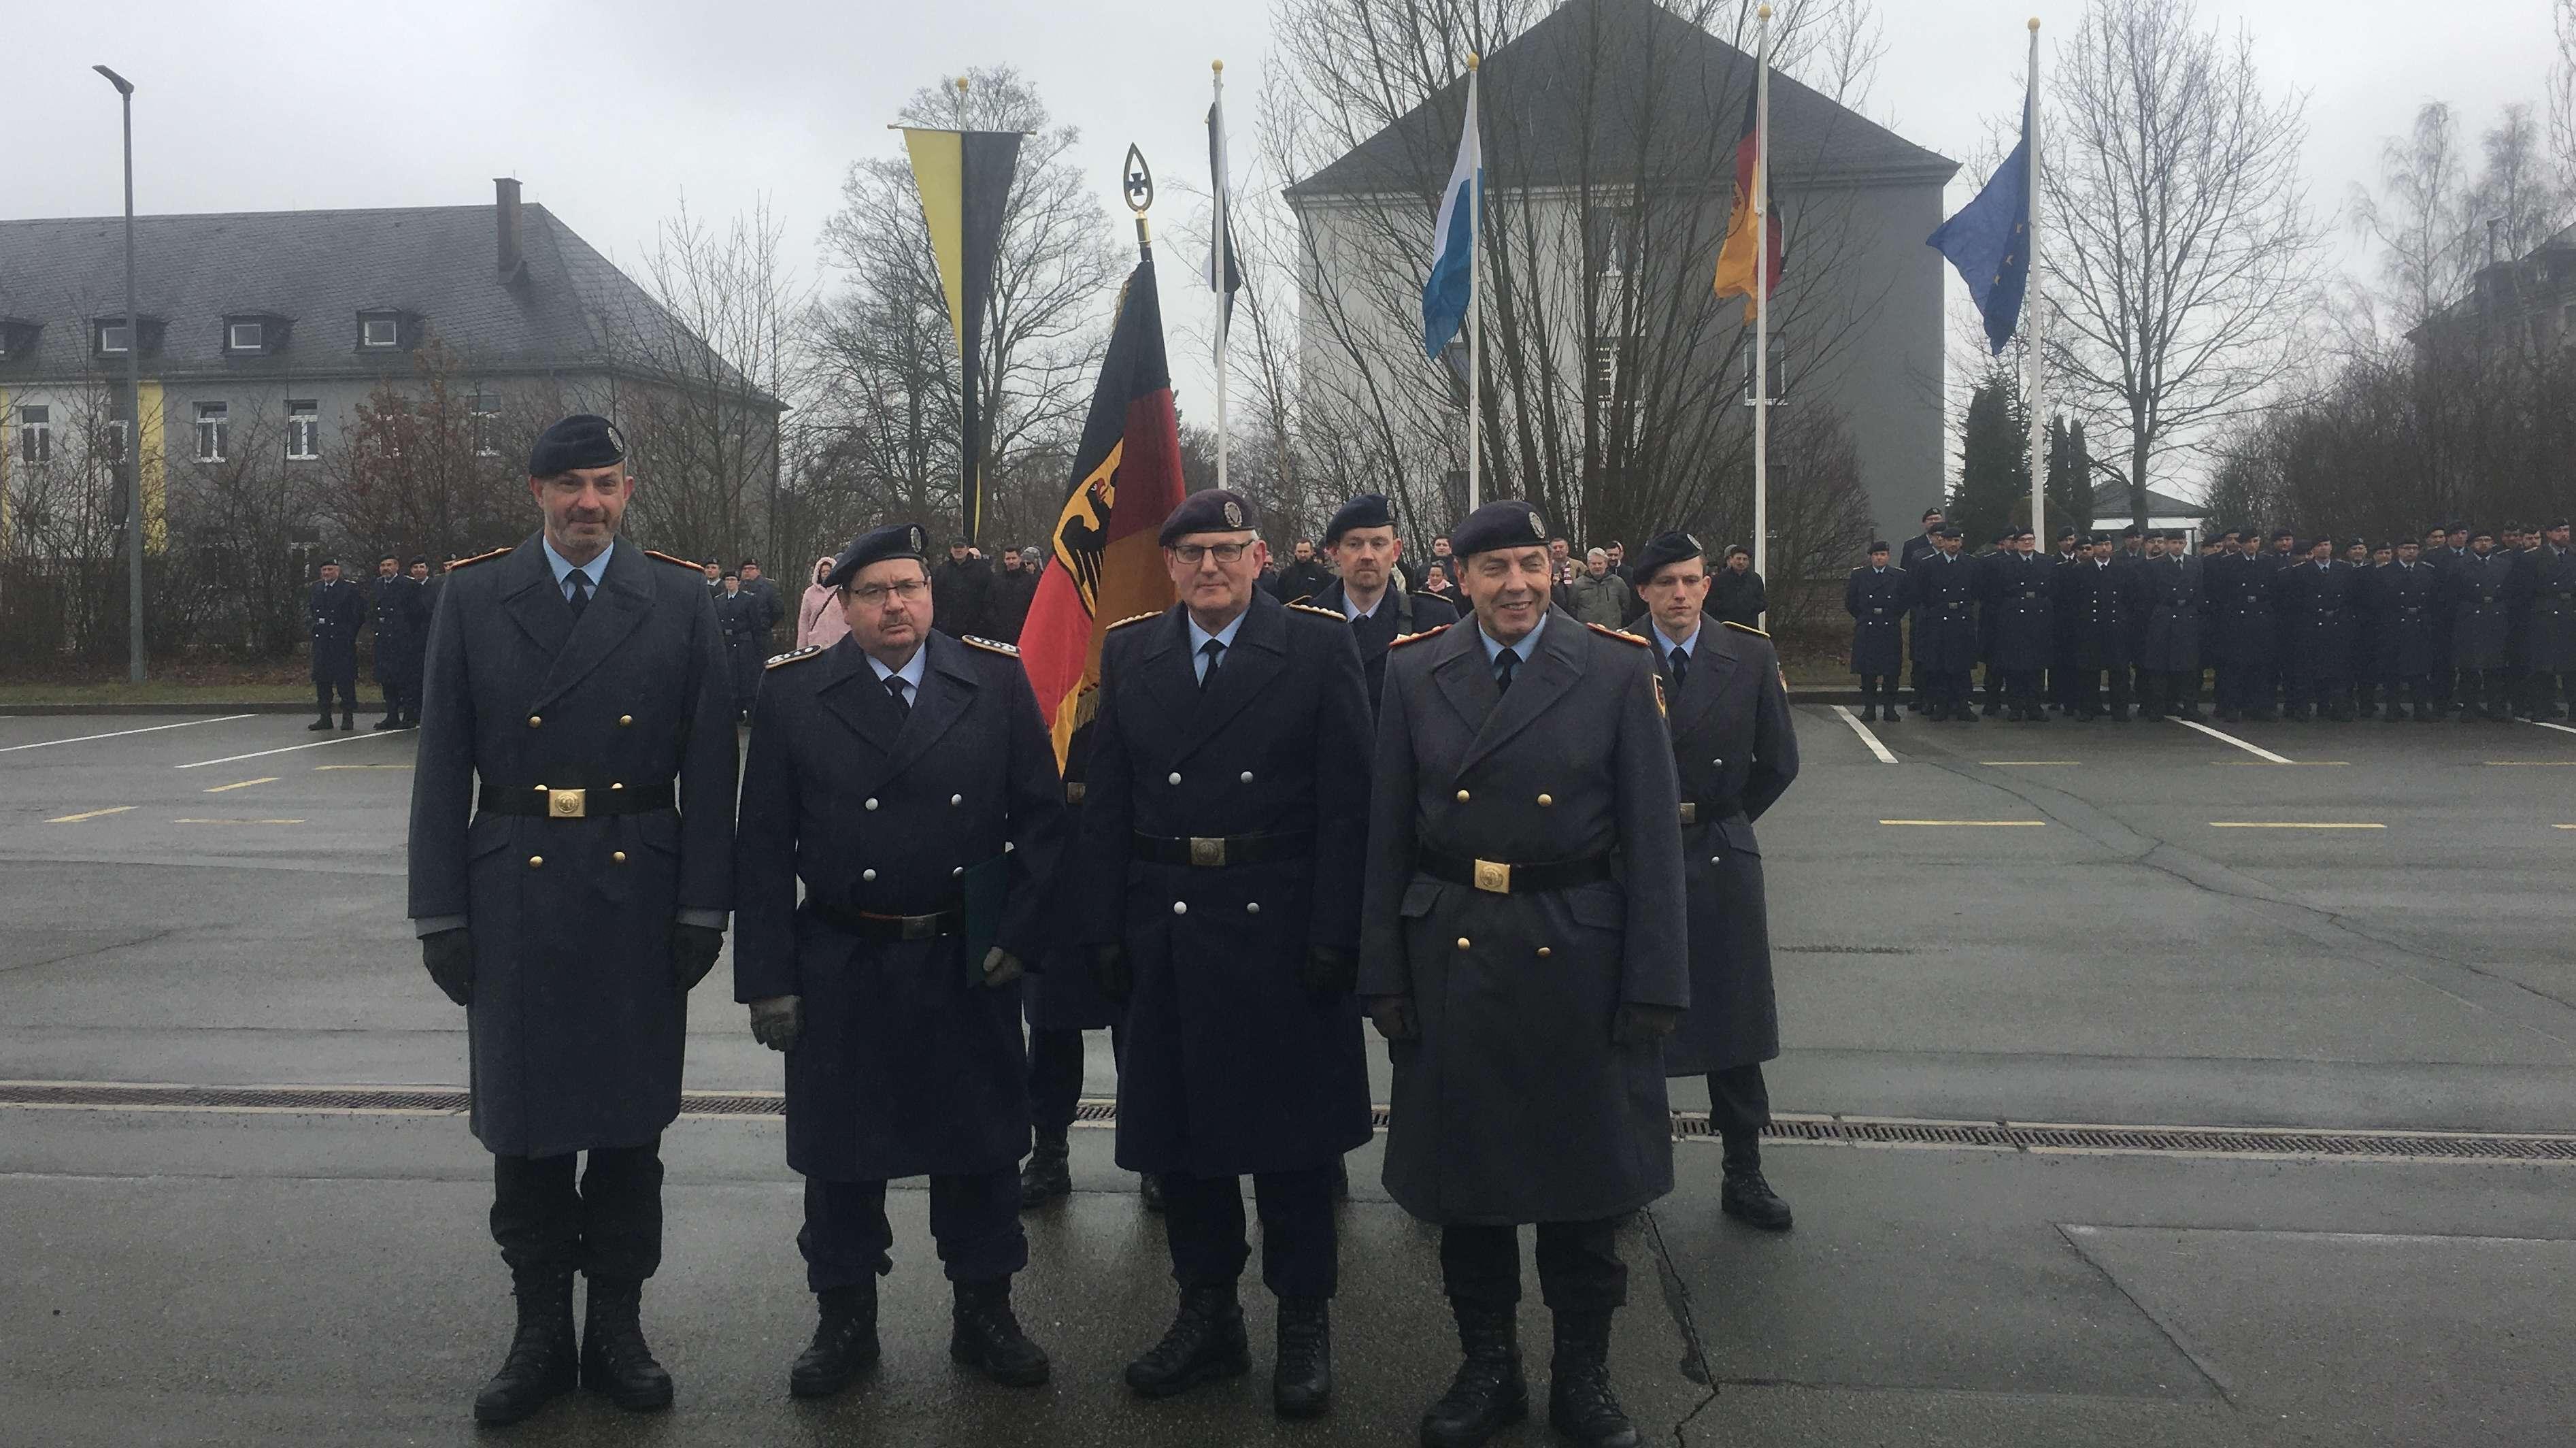 v.l.n.r.: Brigardegeneral Dag Baehr, Oberst Norbert Reineke, Oberst Torsten Grefe, Generalmajor Axel Binder